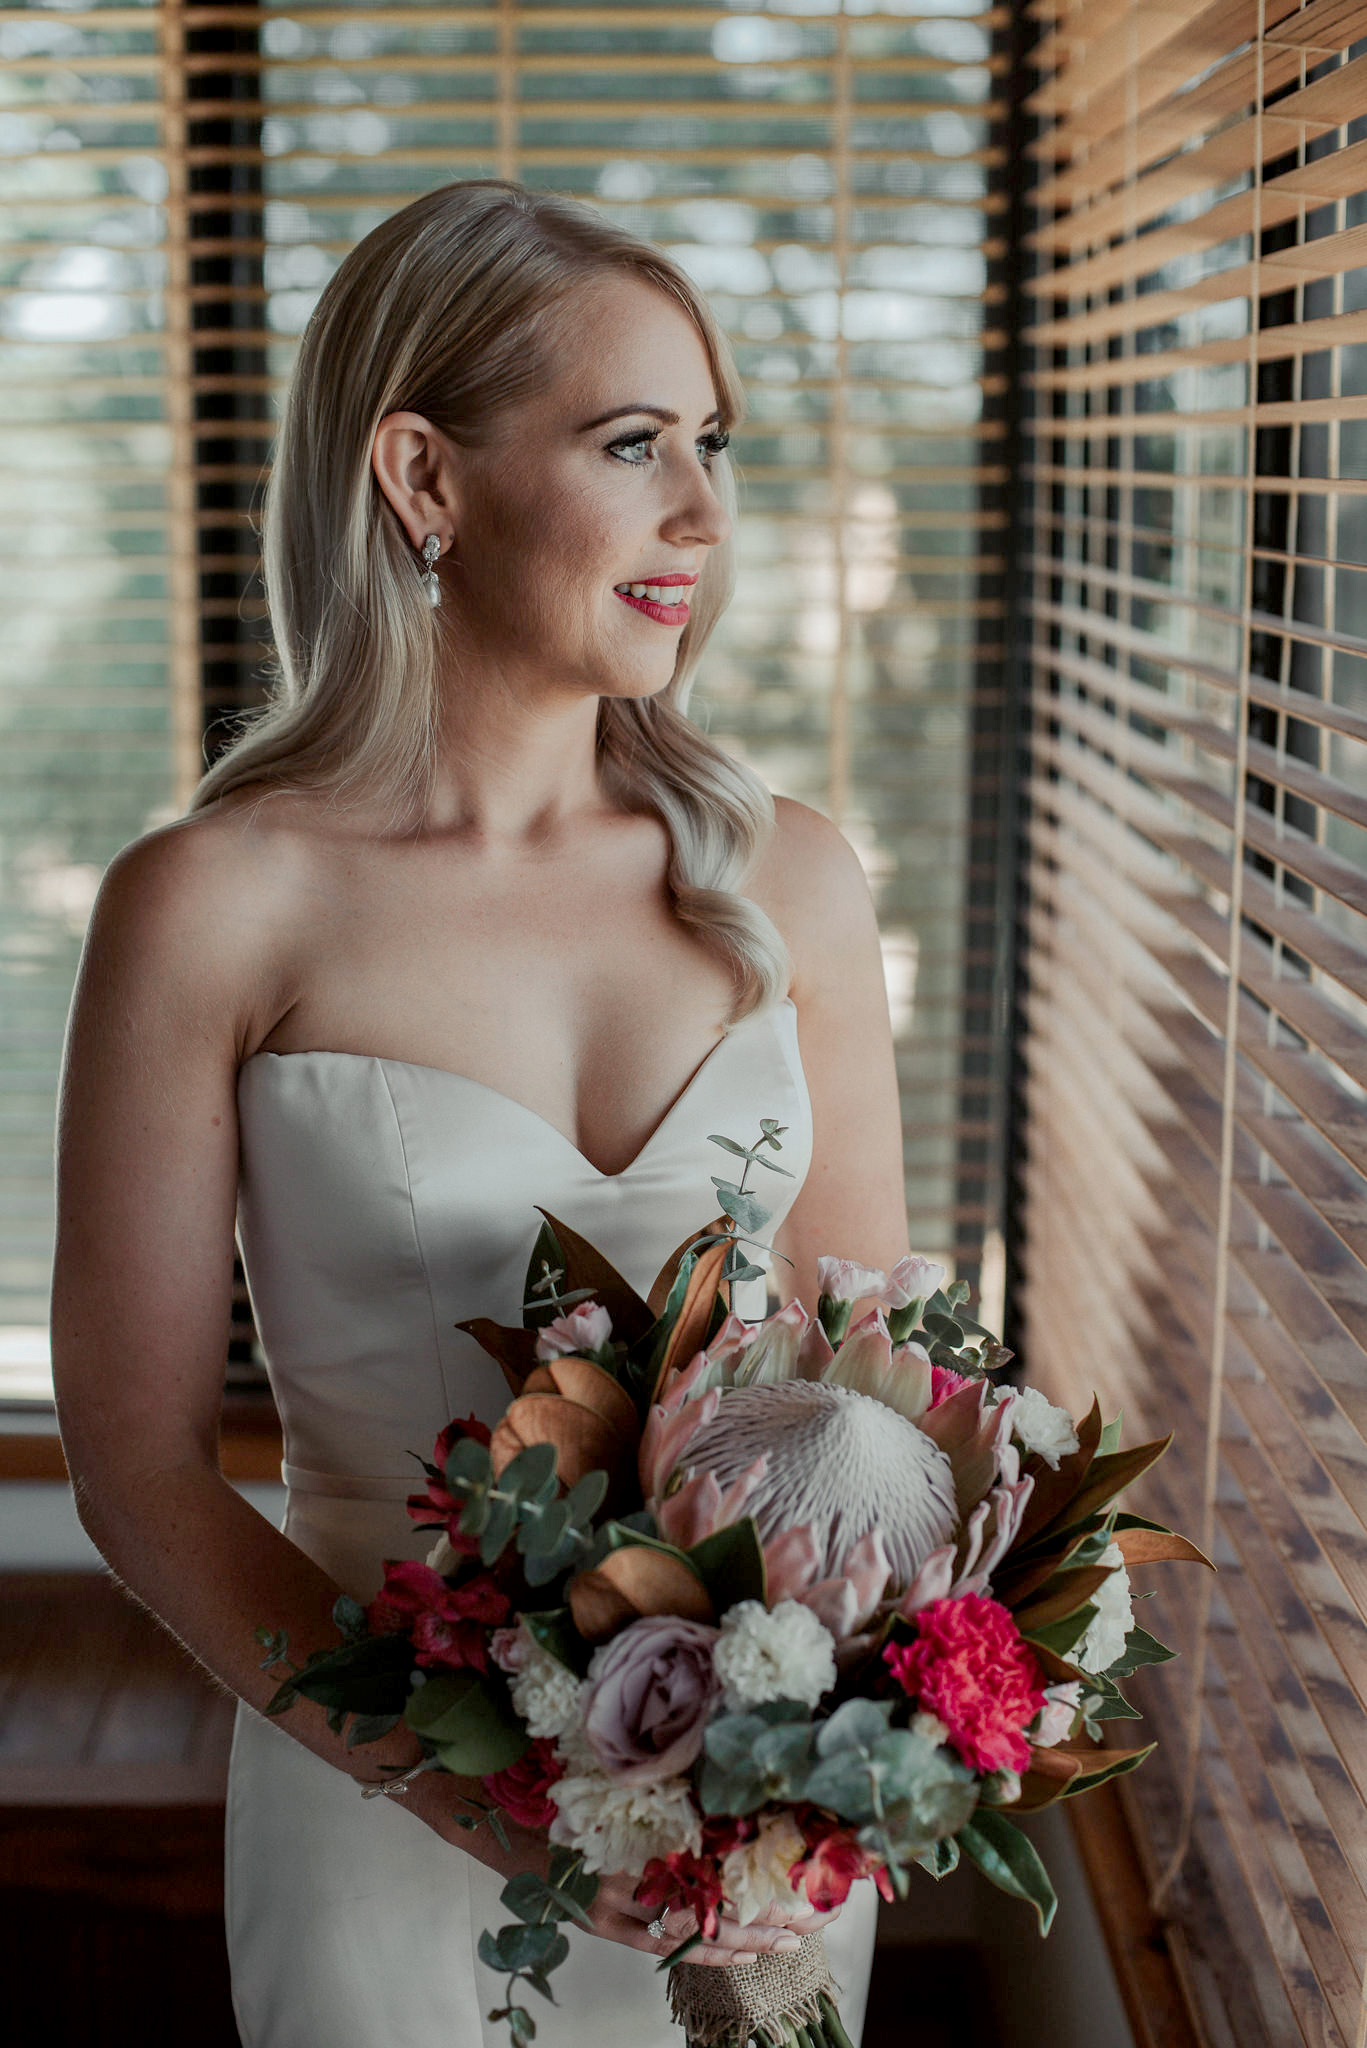 carnation wedding ideas shannon stent